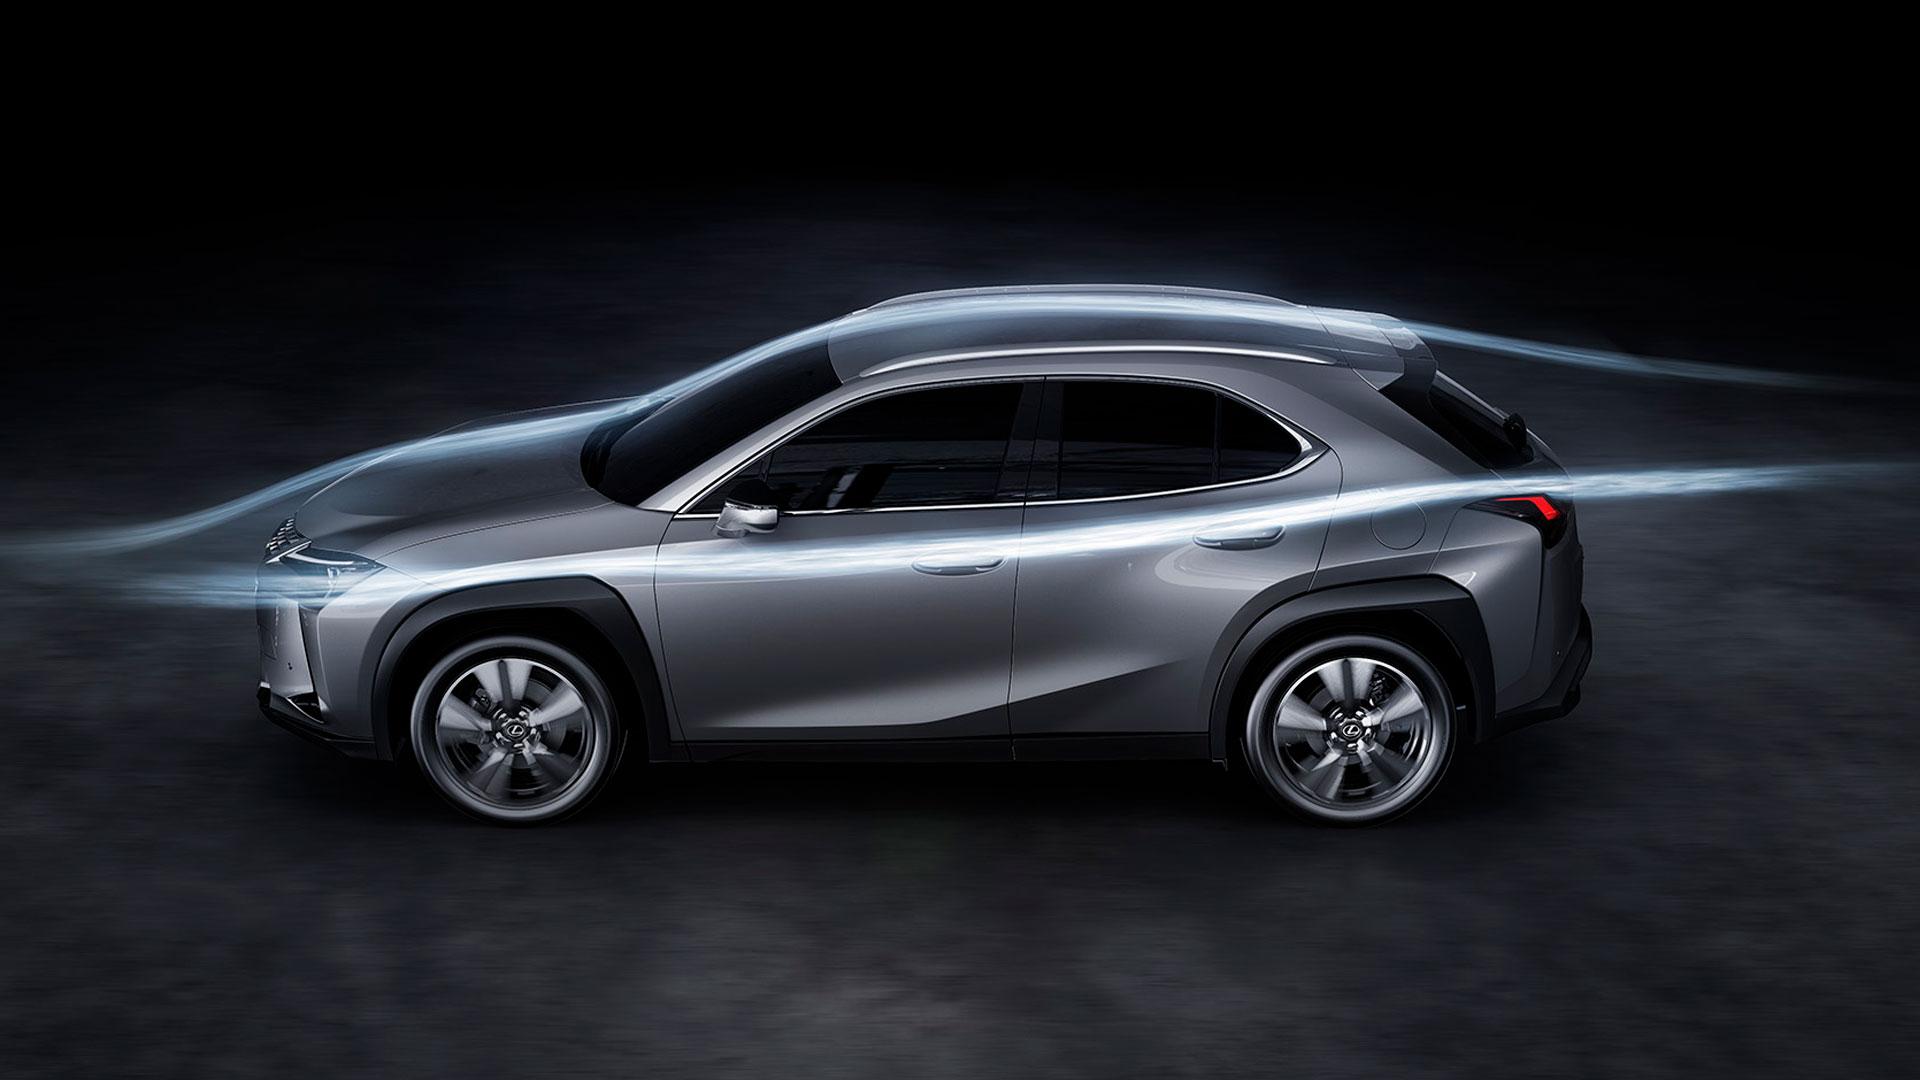 Aerodinámica Lexus UX hero asset